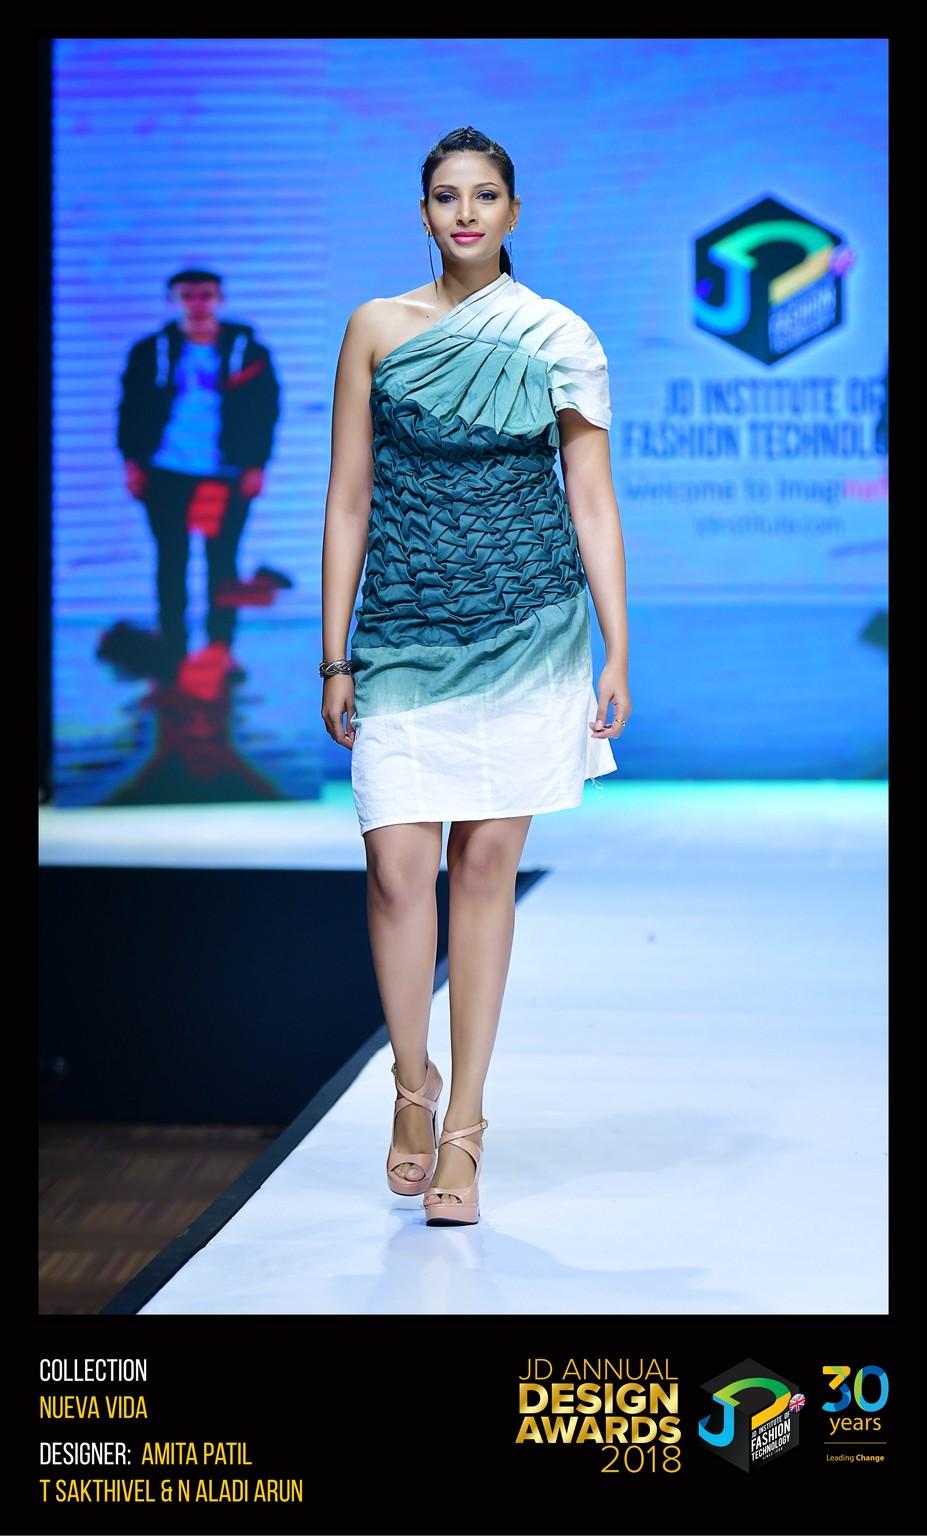 Nueva Vida – Change – JD Annual Design Awards 2018   Designer: Shakthi, Arun and Amitha   Photography : Jerin Nath (@jerin_nath) nueva vida - NUEVA VIDA 5 - Nueva Vida – Change – JD Annual Design Awards 2018